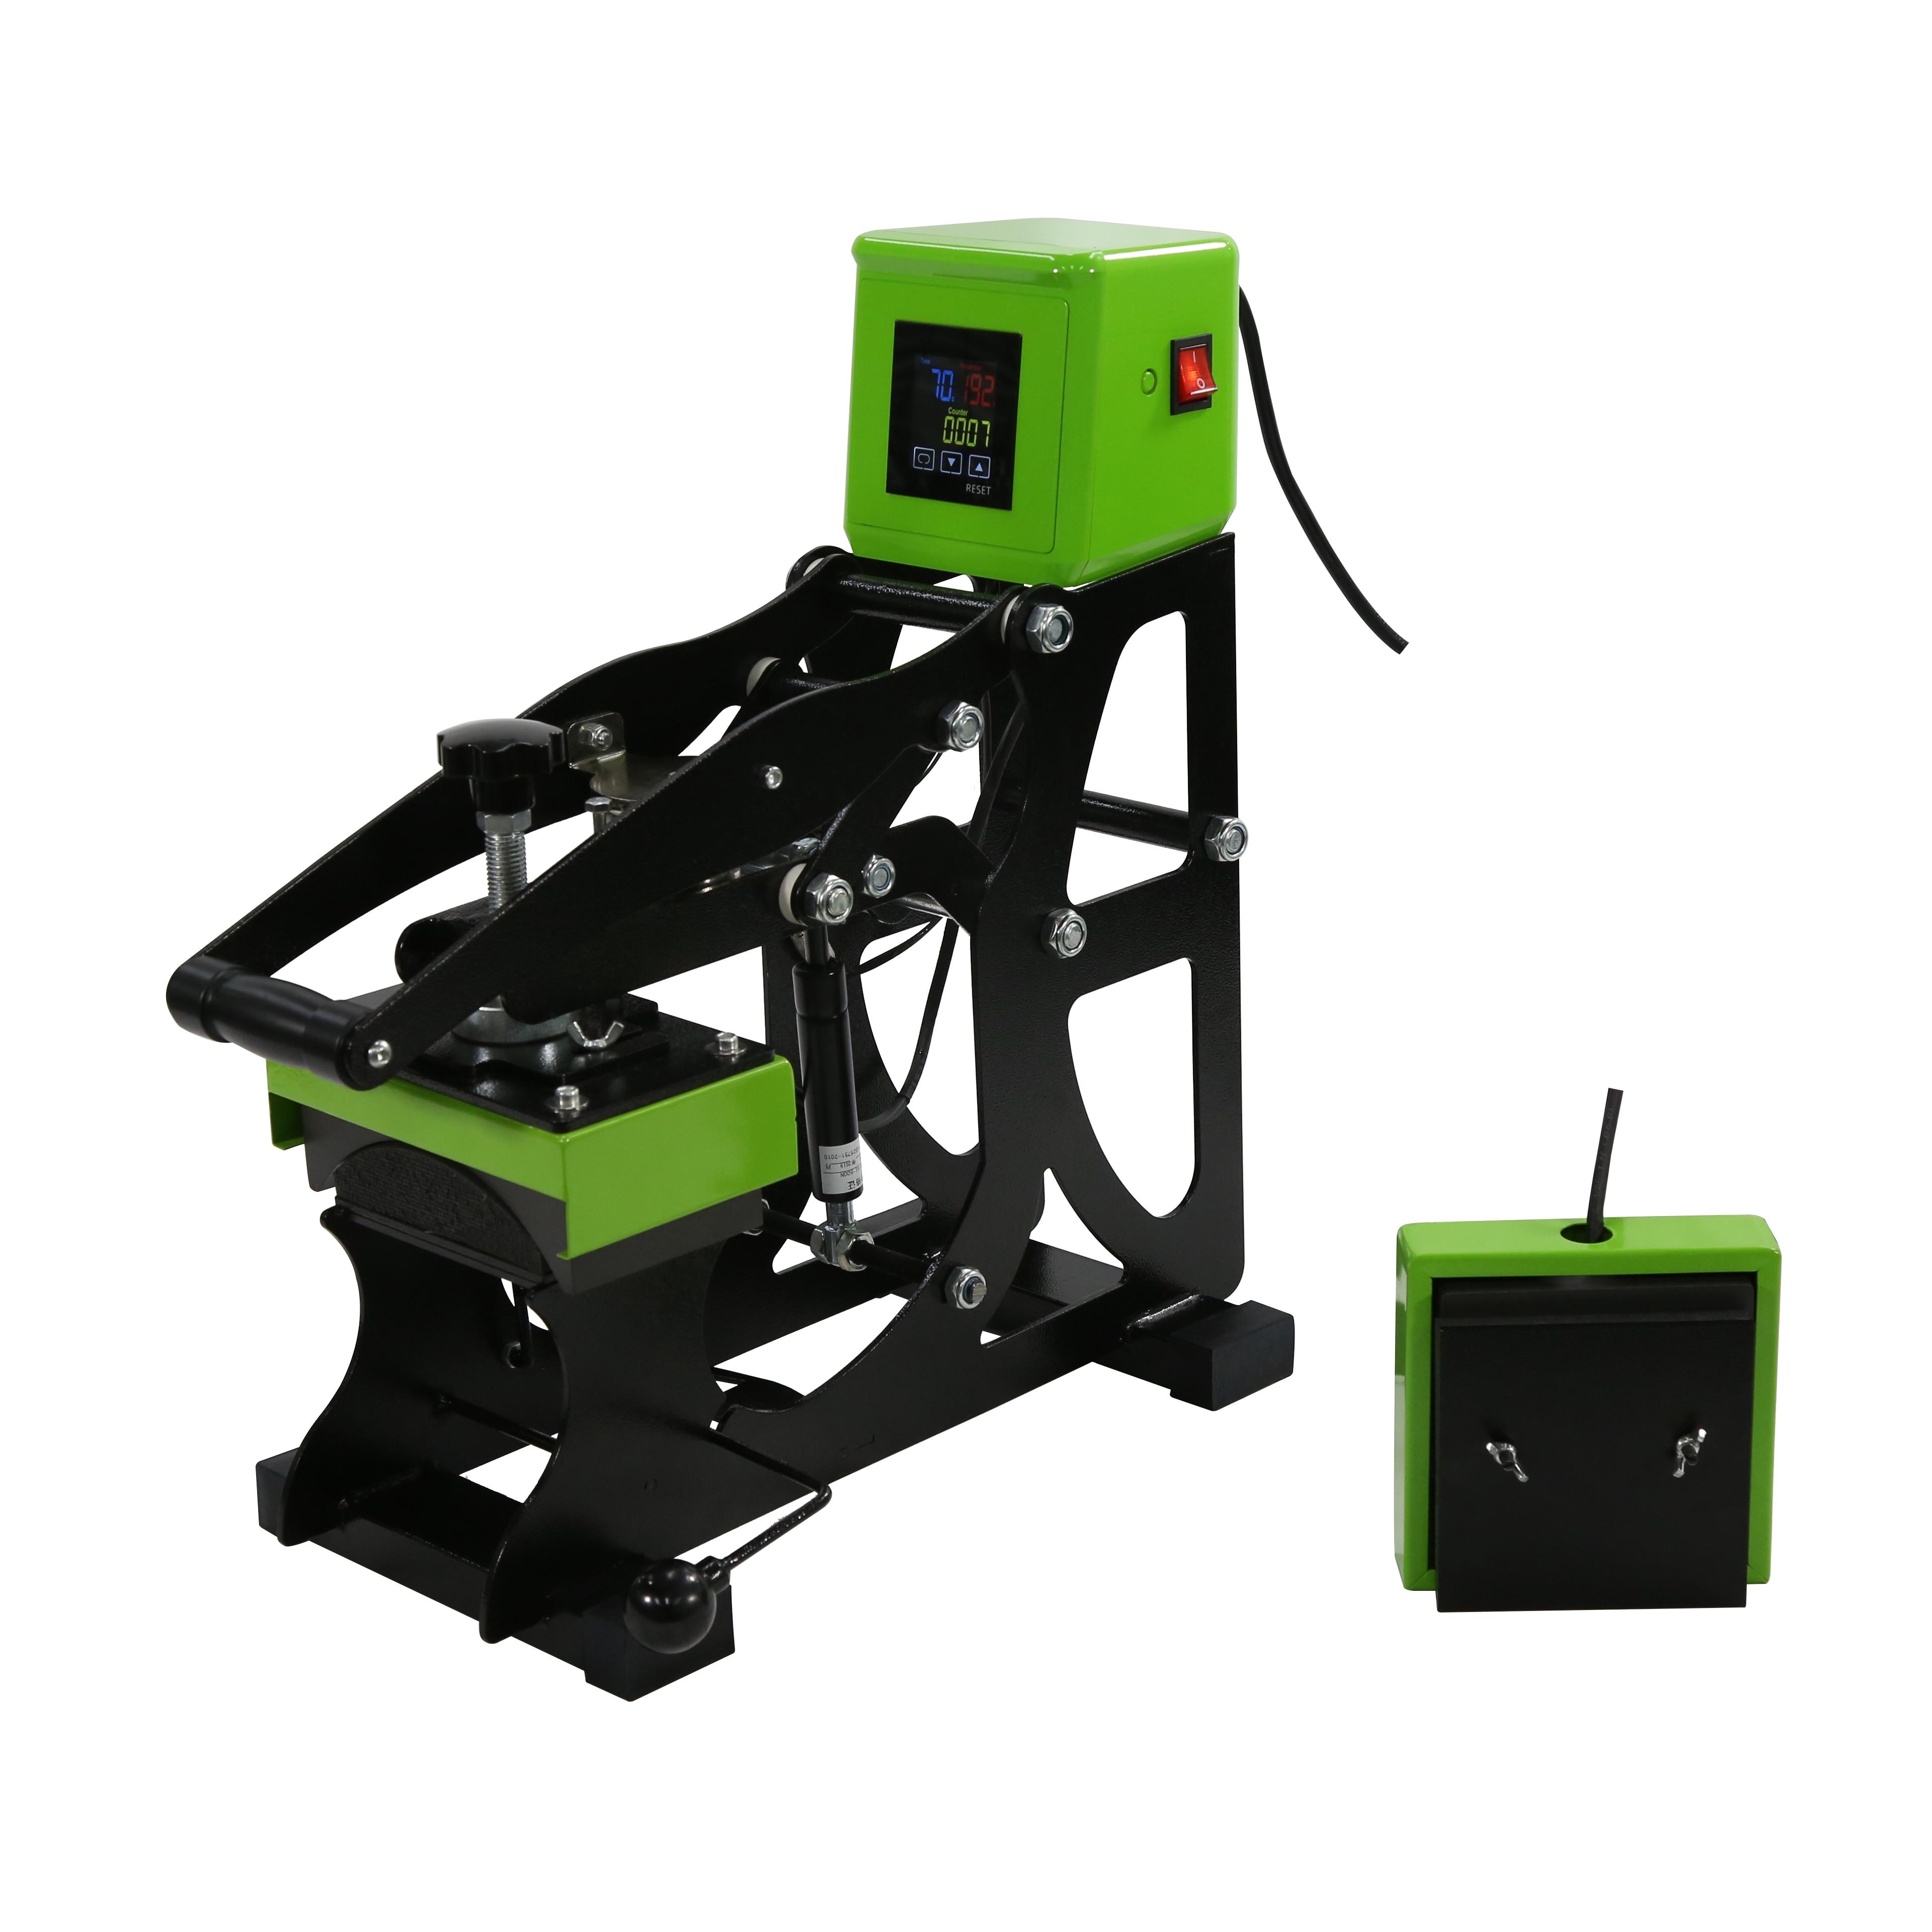 New color 2IN1 Semi auto T-shirt and Cap Heat Press Printing Machine Flat heat transfer size 12x12cm NO.AH1701